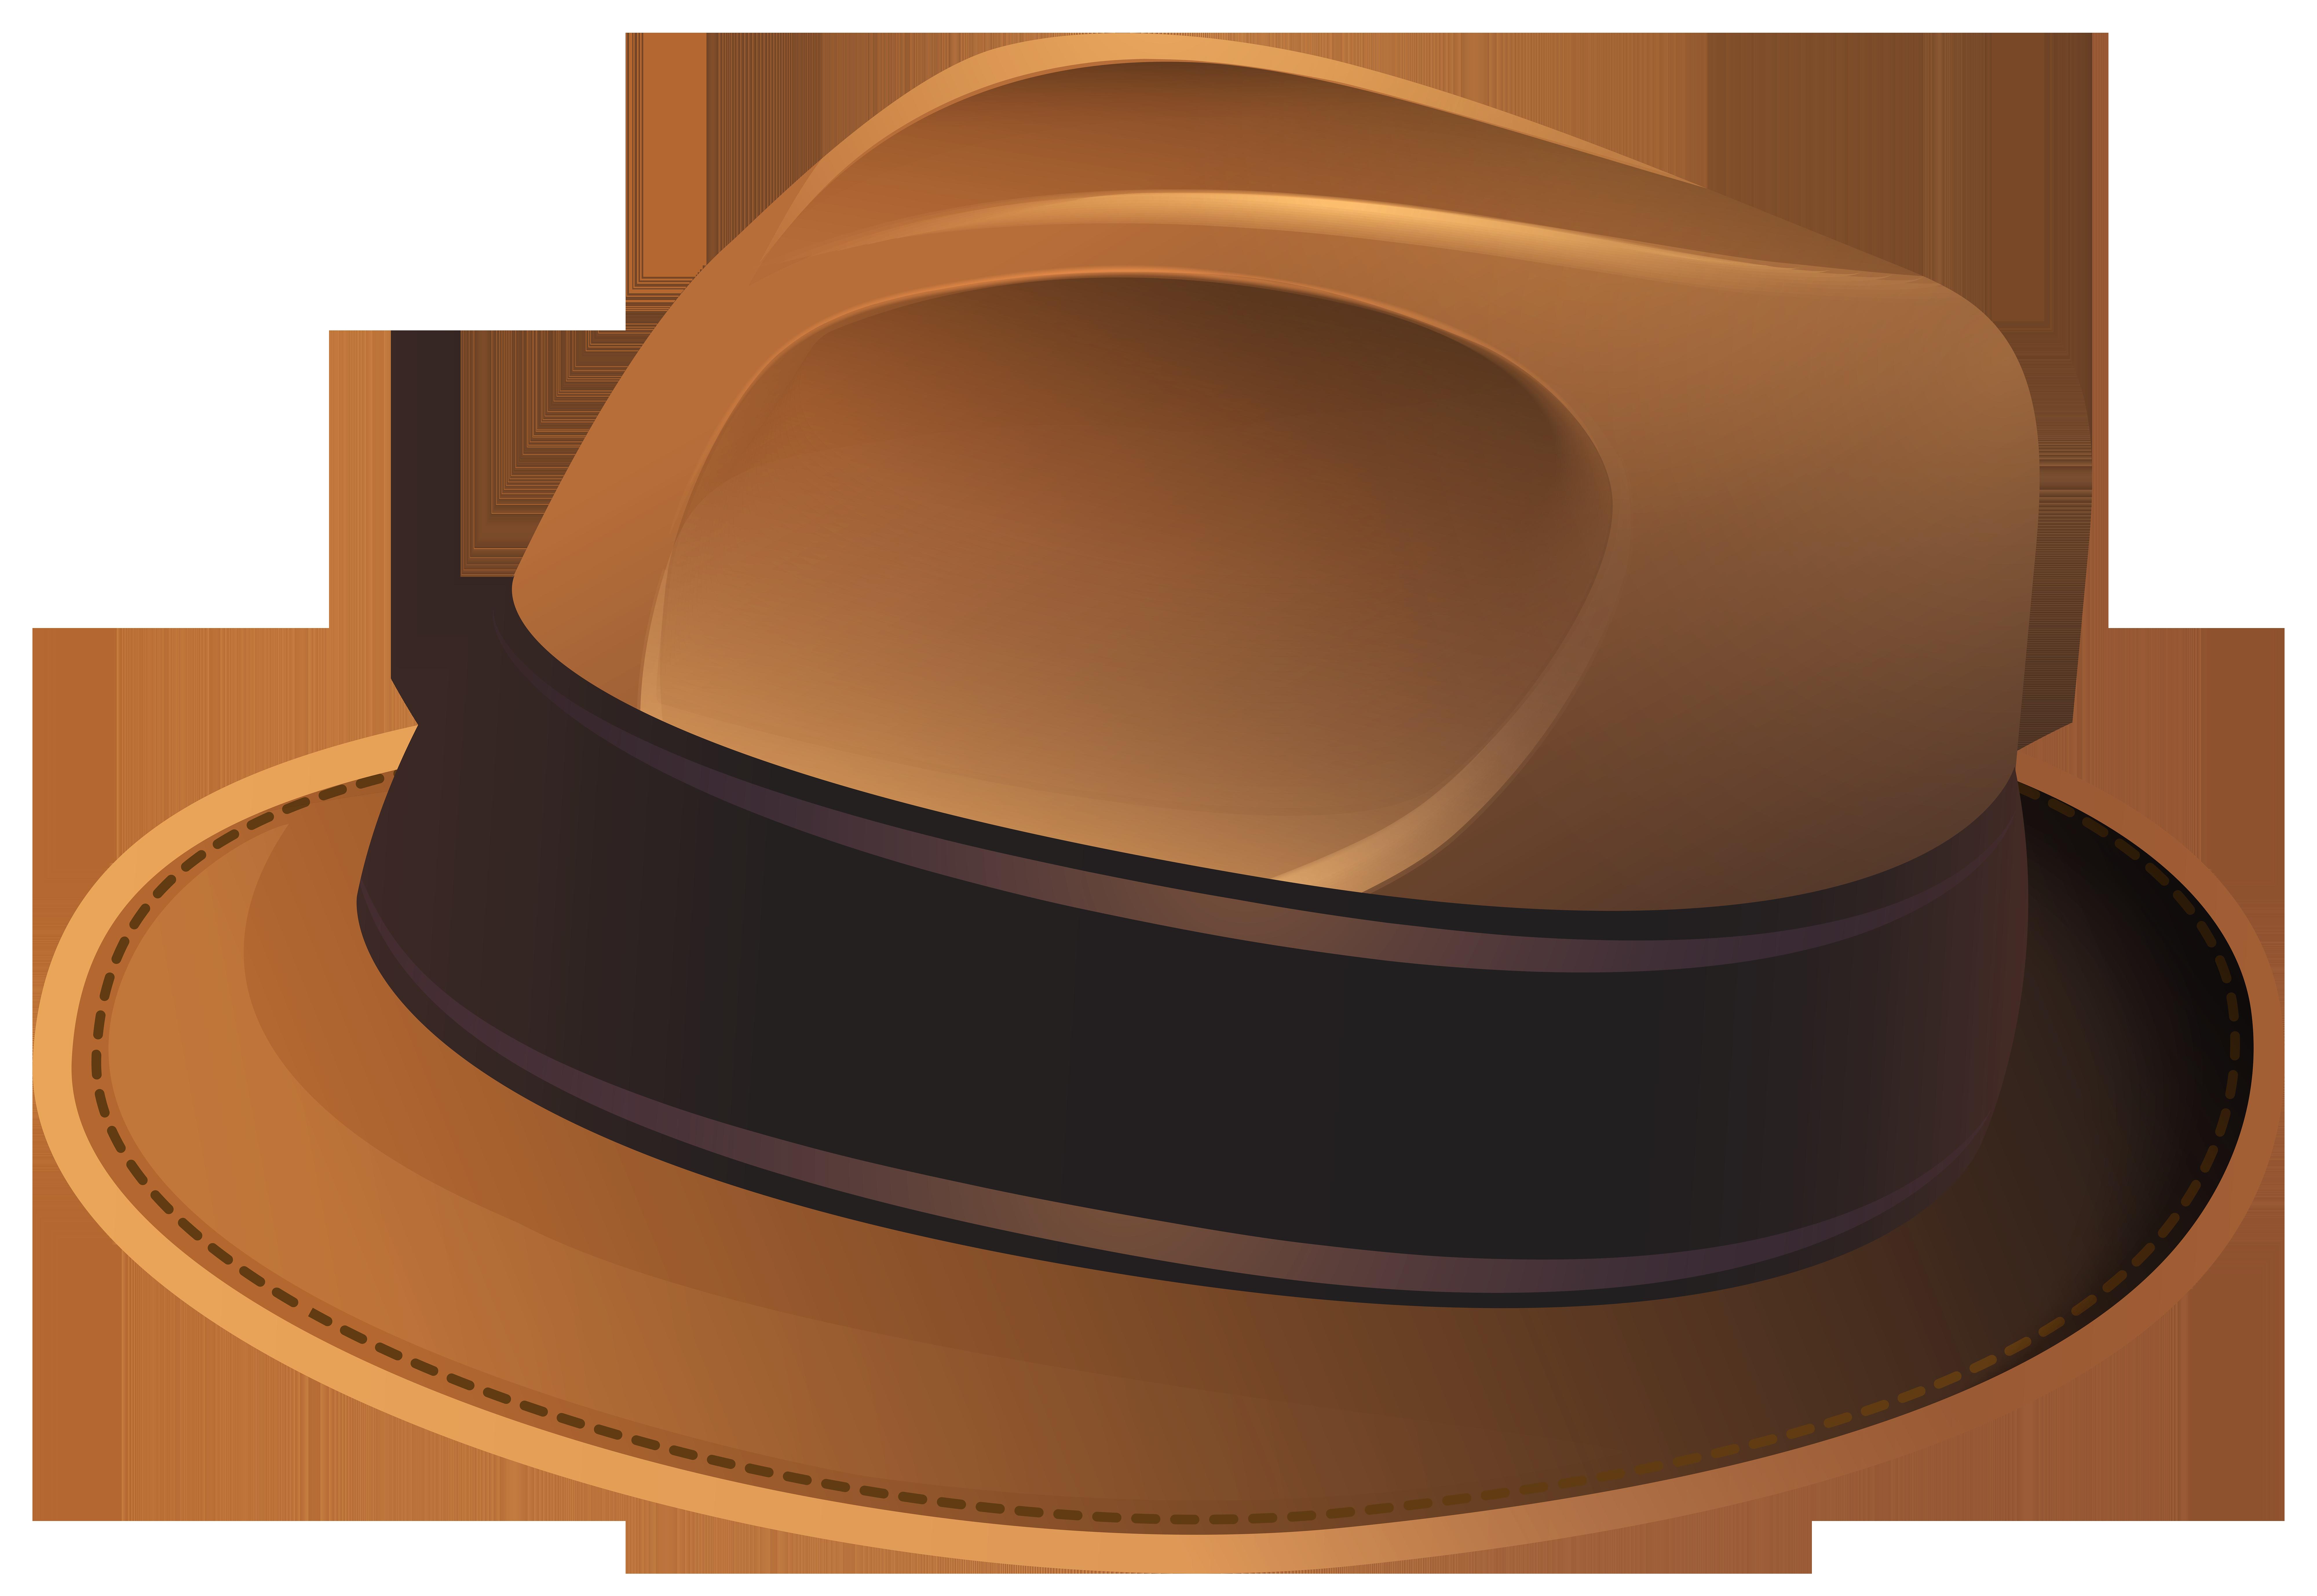 Brown Hat Transparent PNG Clip Art Image.